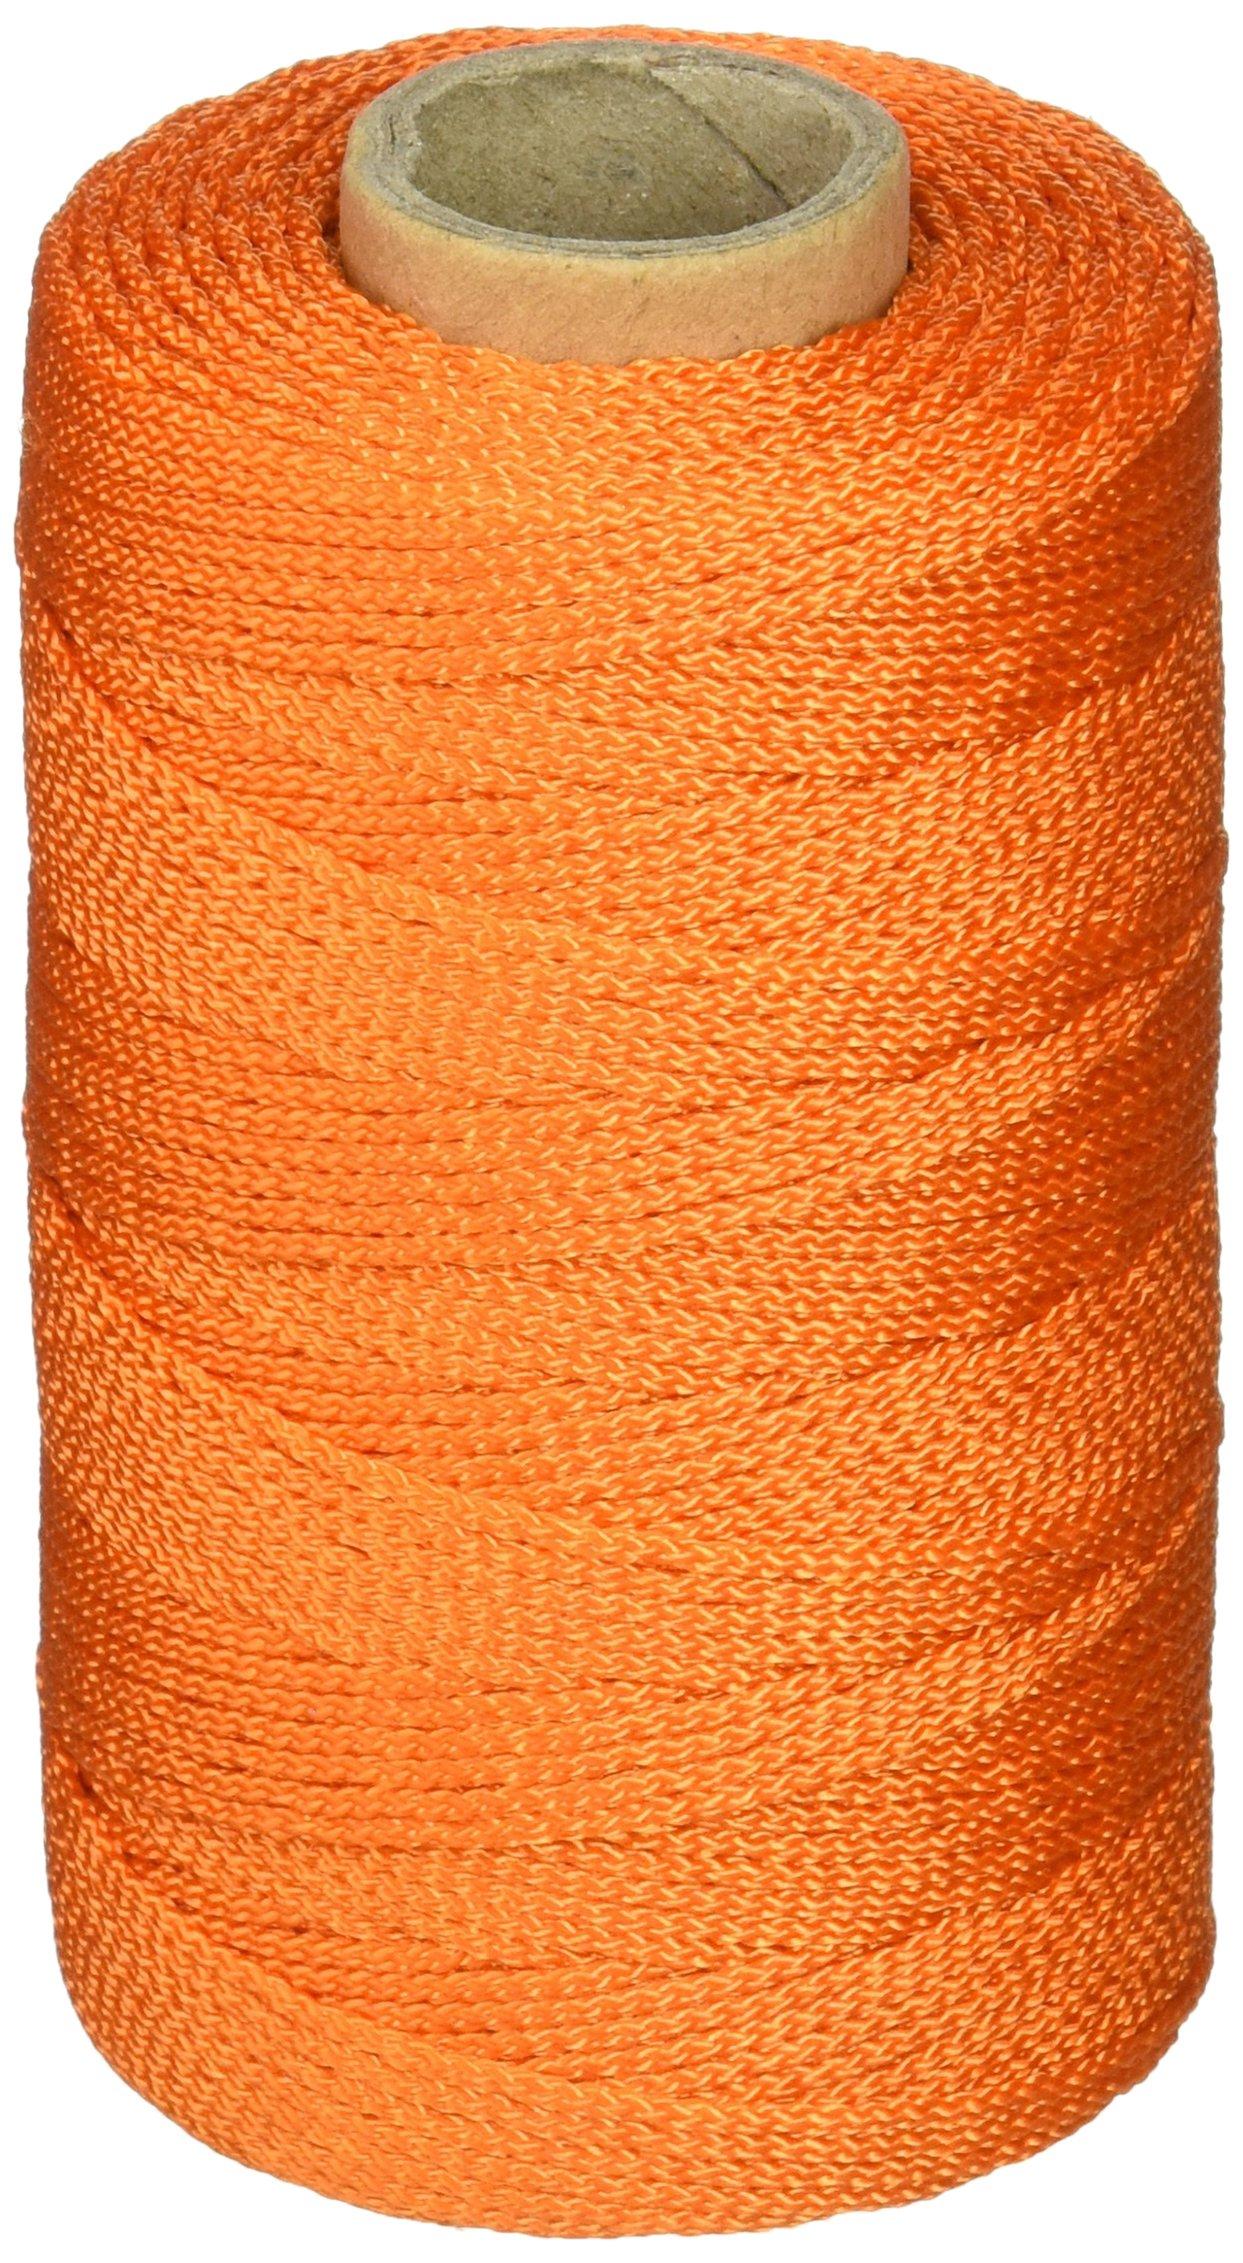 Irwin Tools 2034404 Irwin Industrial Tool Orange Mason Line - 500' by Irwin Tools